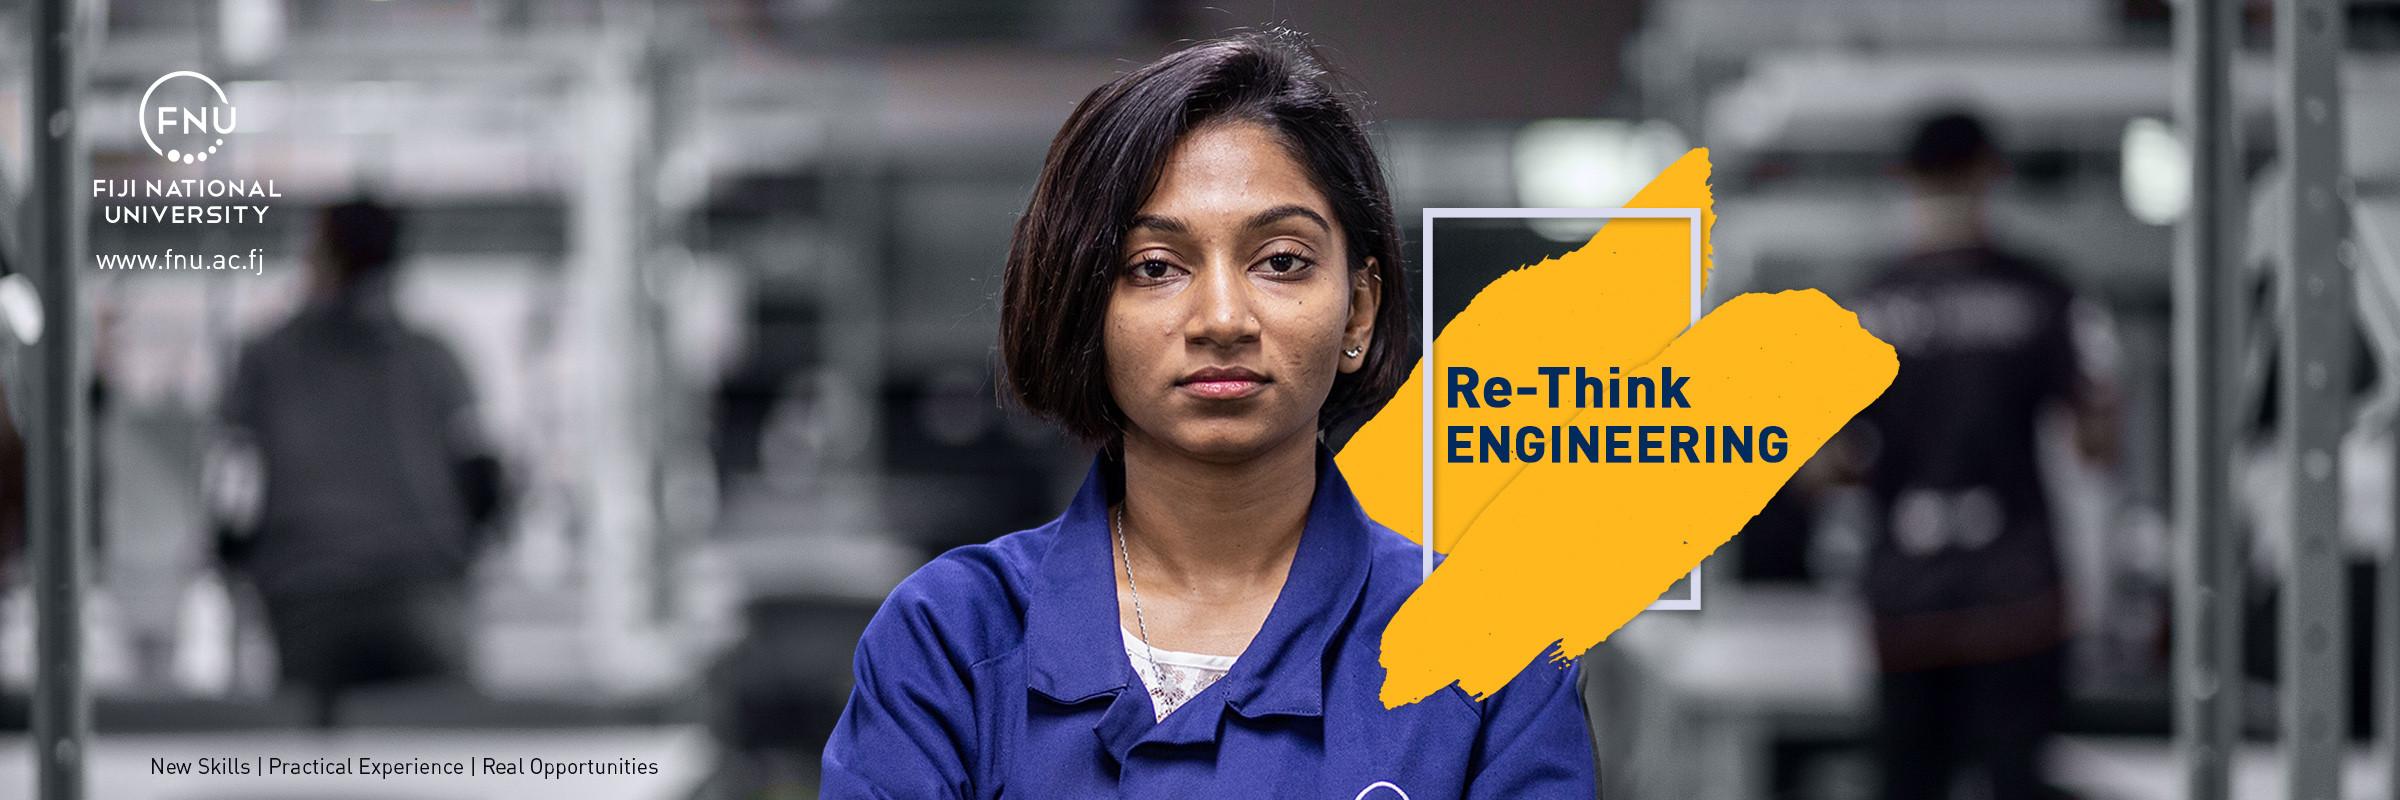 Re-think Engineering